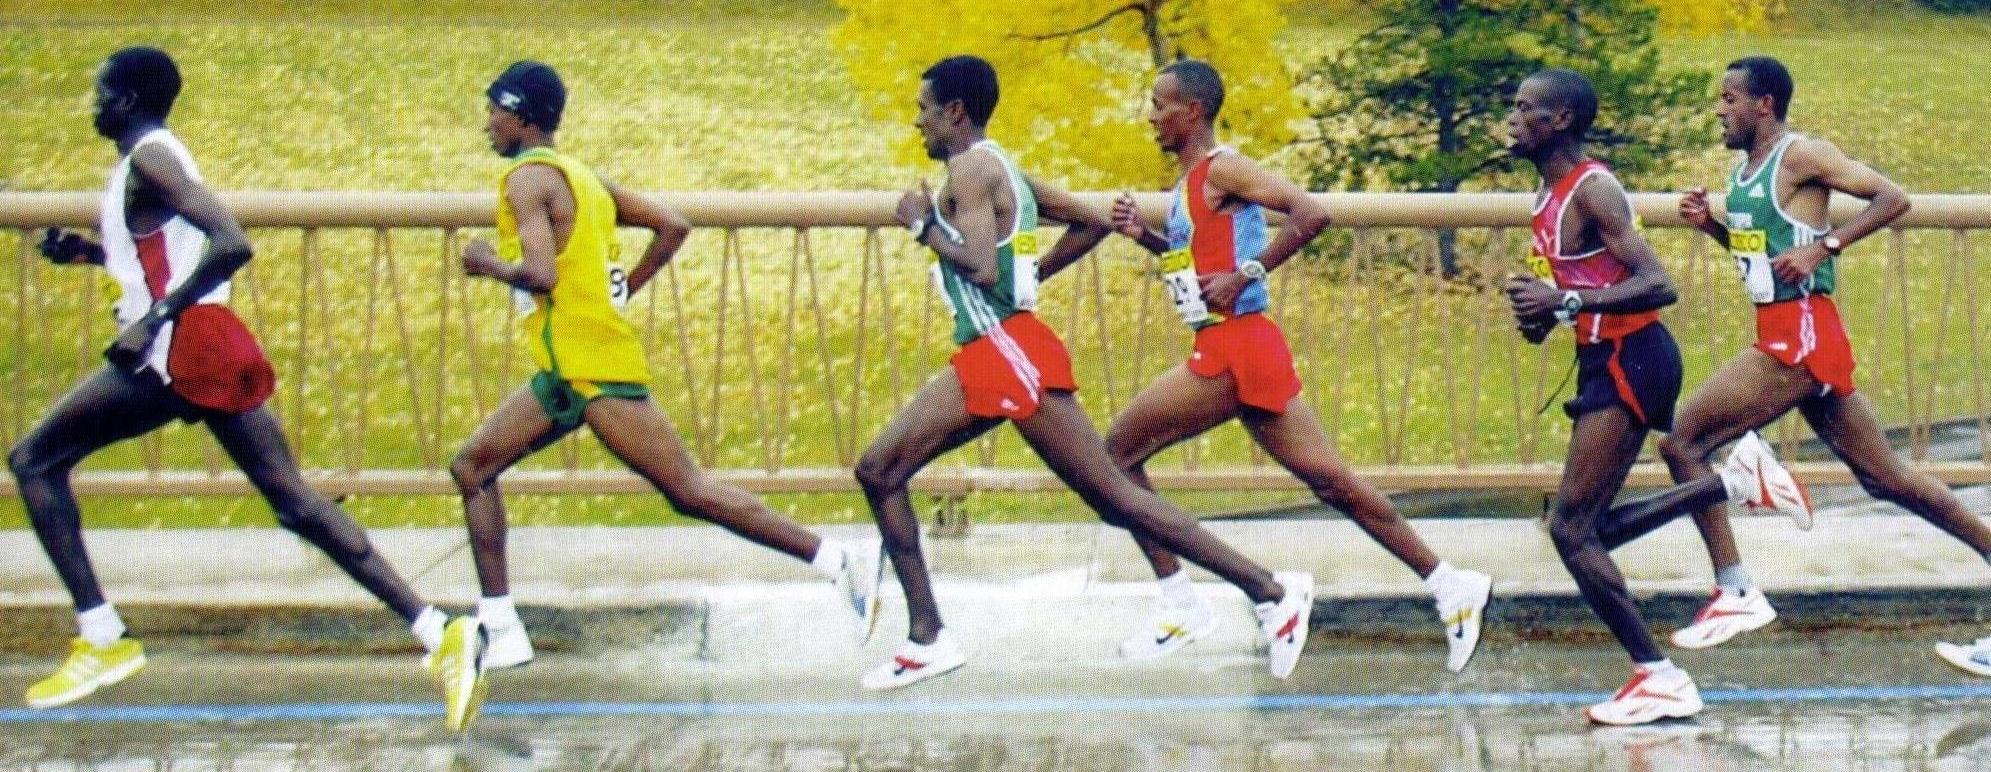 kenyans do it better!